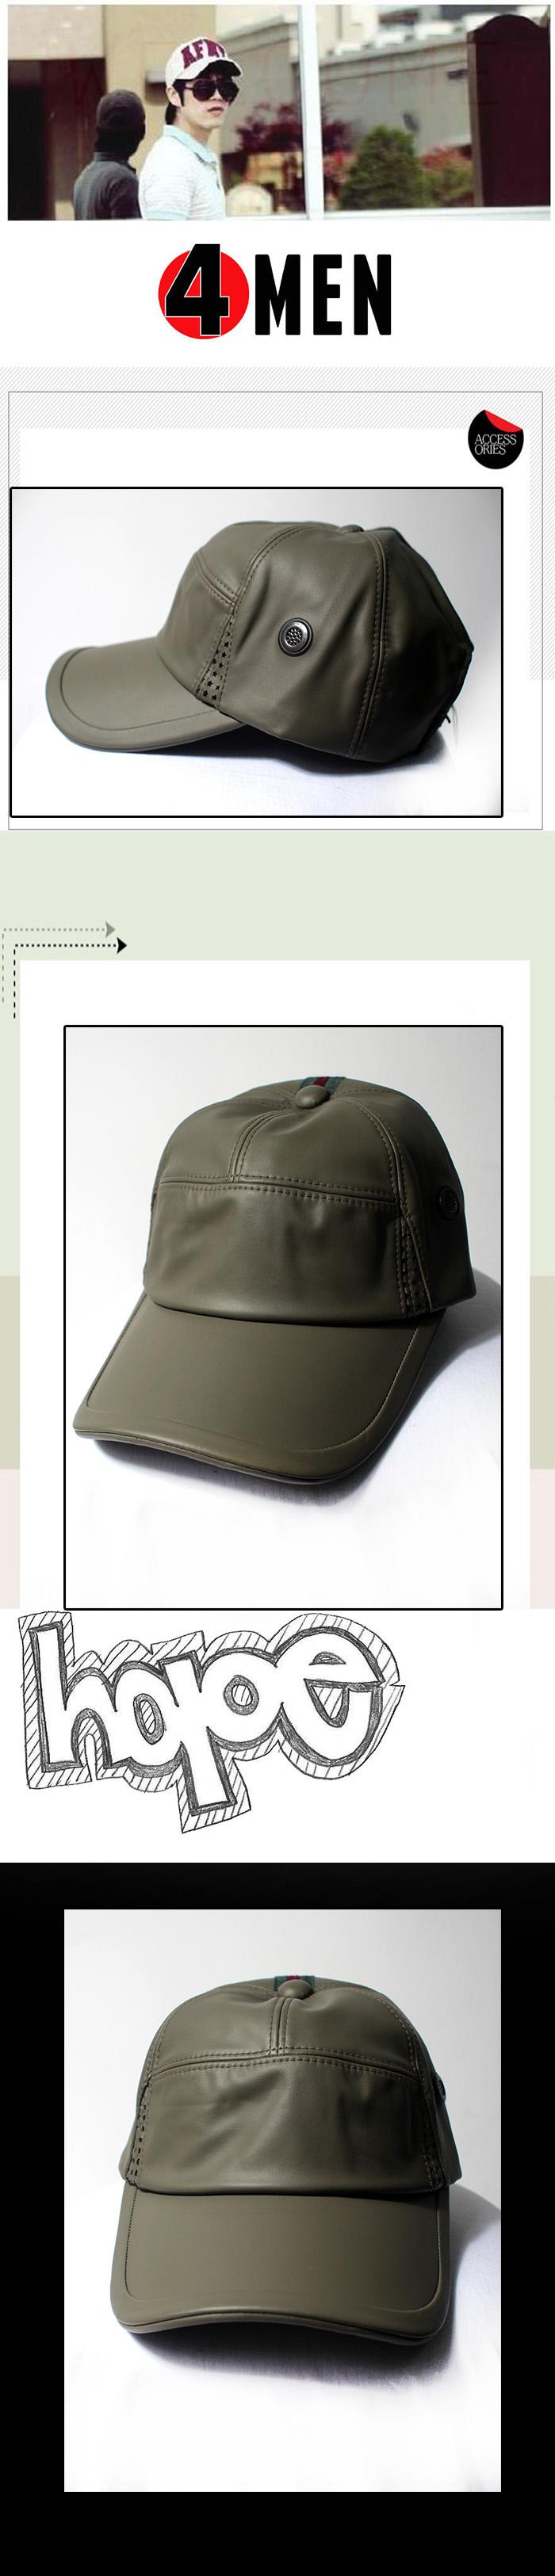 Nón da xanh rêu nf066 - 1